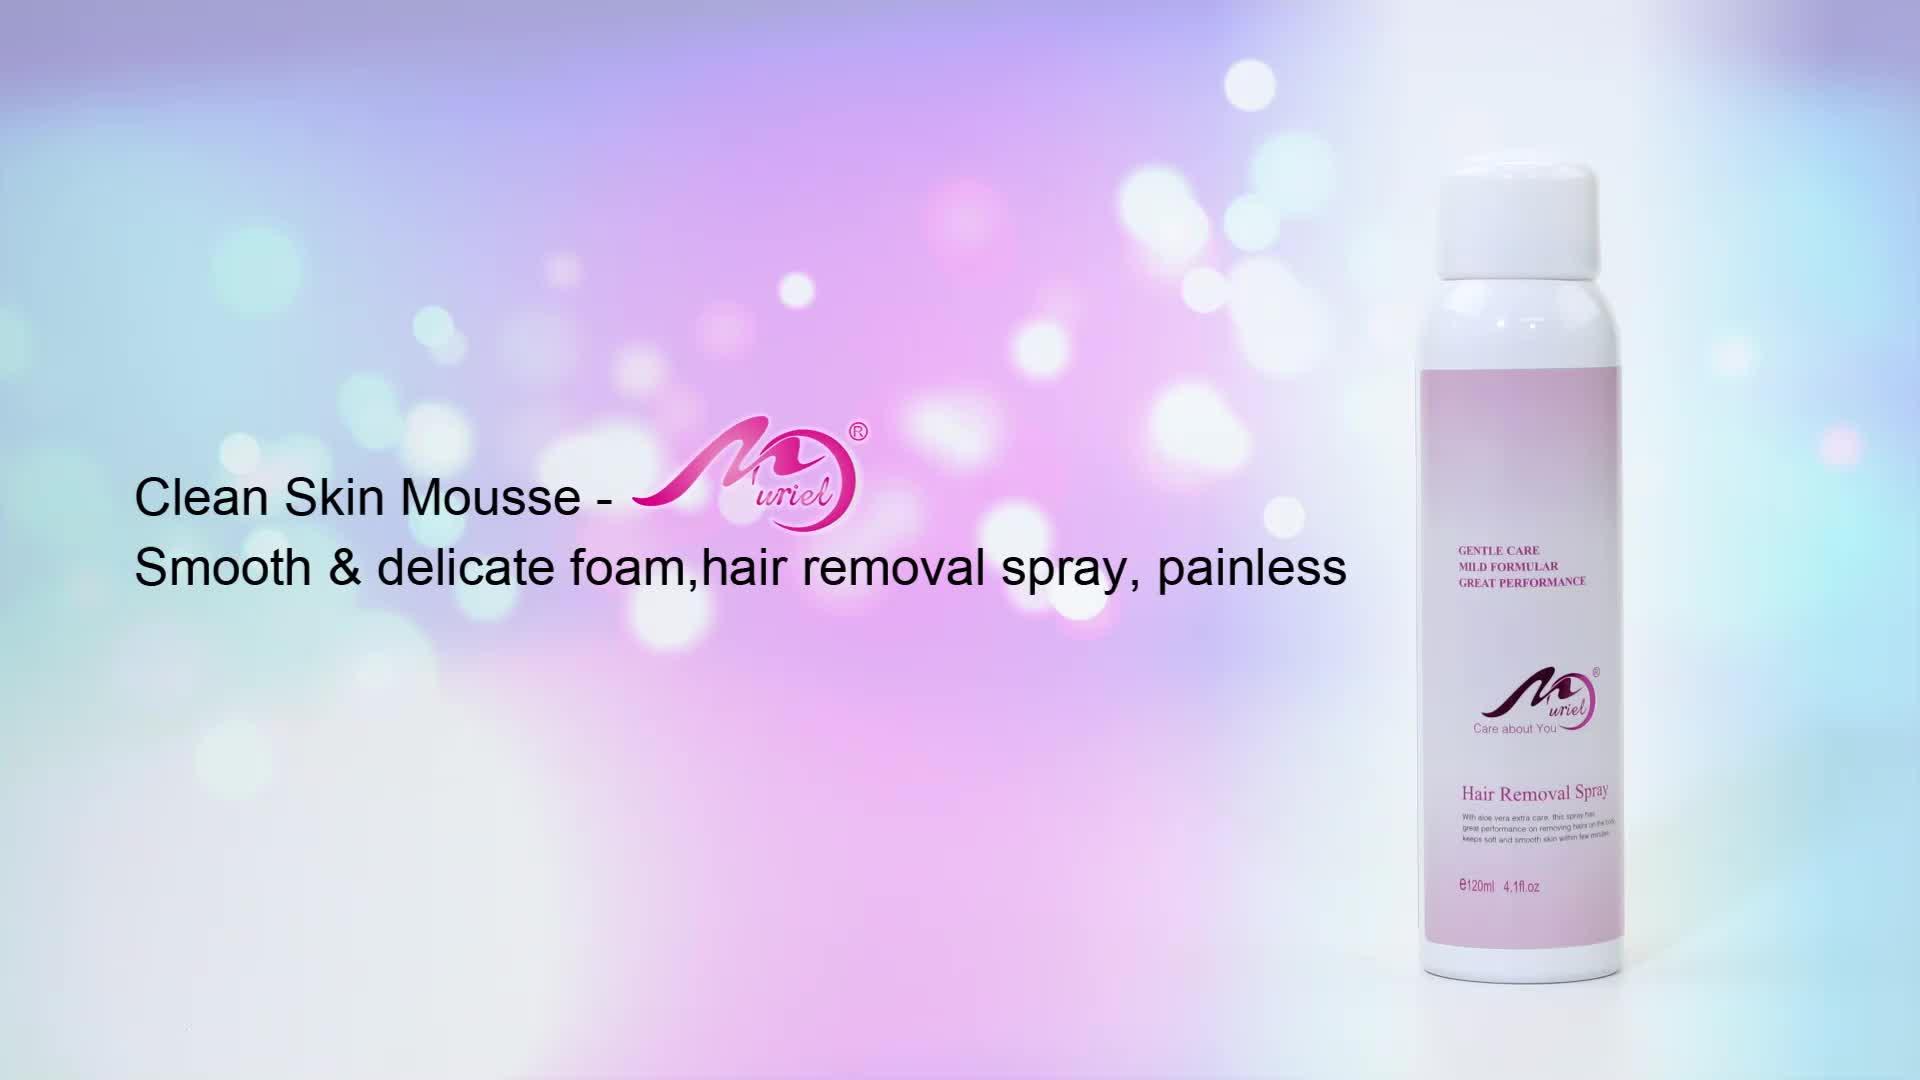 Depilation Hair Removal Cream Smooth Chest Body Hair Removal Spray Cream